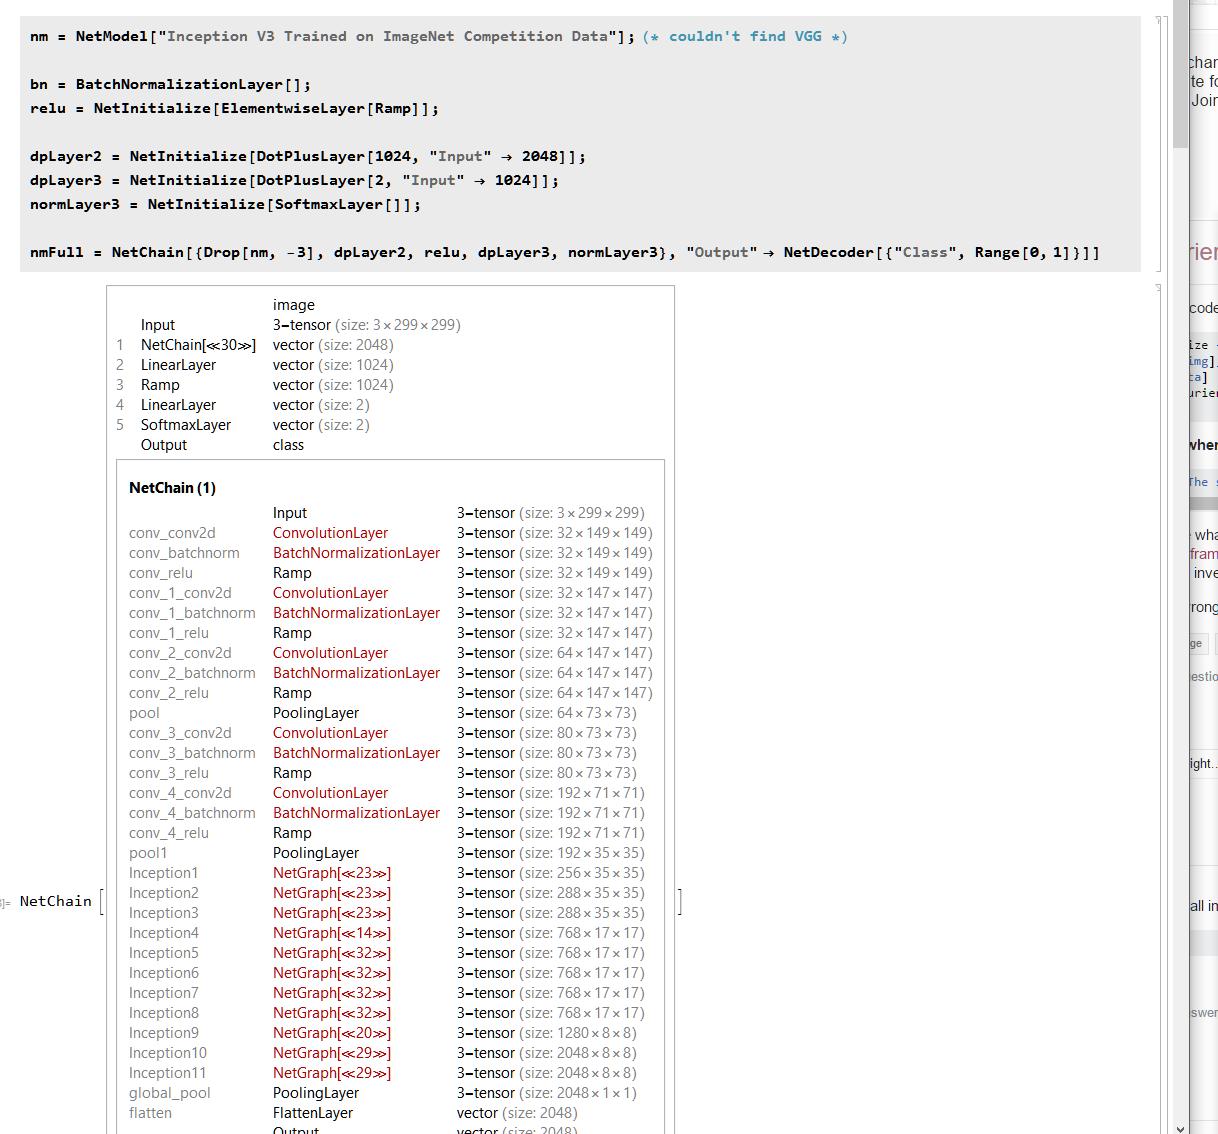 Using NetModel to